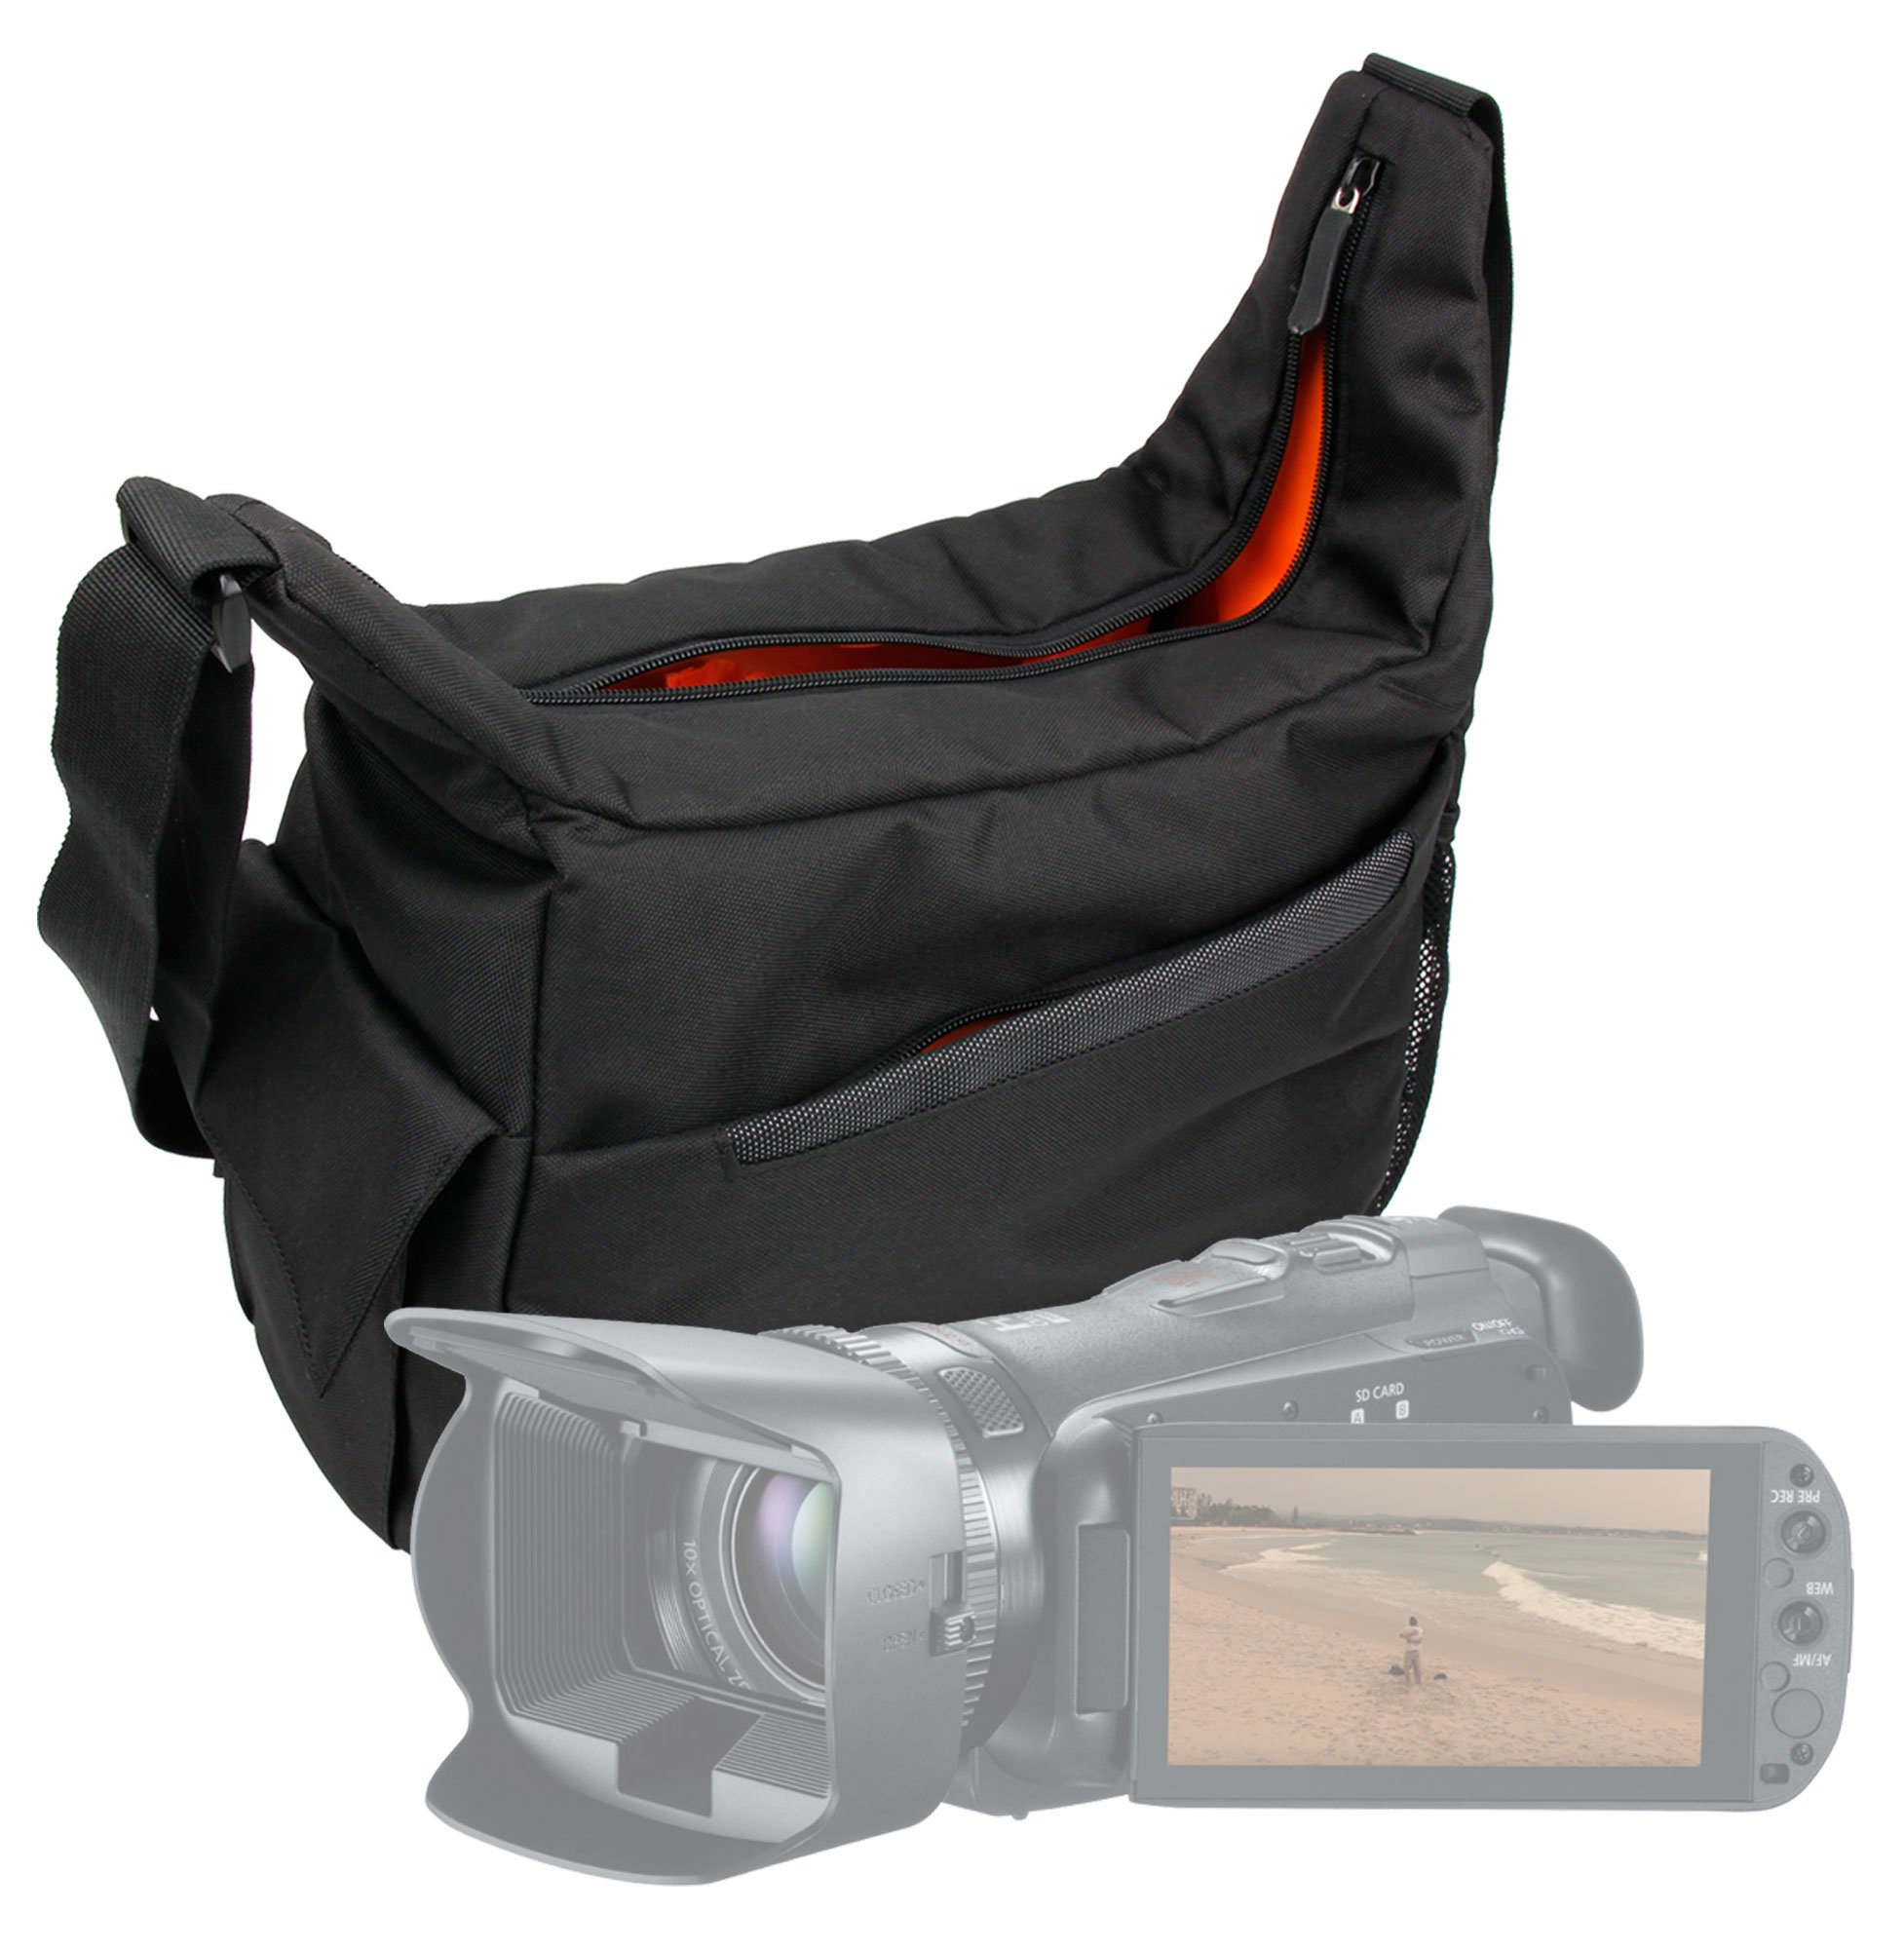 DURAGADGET Premium Quality Shoulder 'Sling' Bag in Black & Orange - Suitable for Canon Vixia HF G20  G10  LEGRIA HF G25 by DURAGADGET